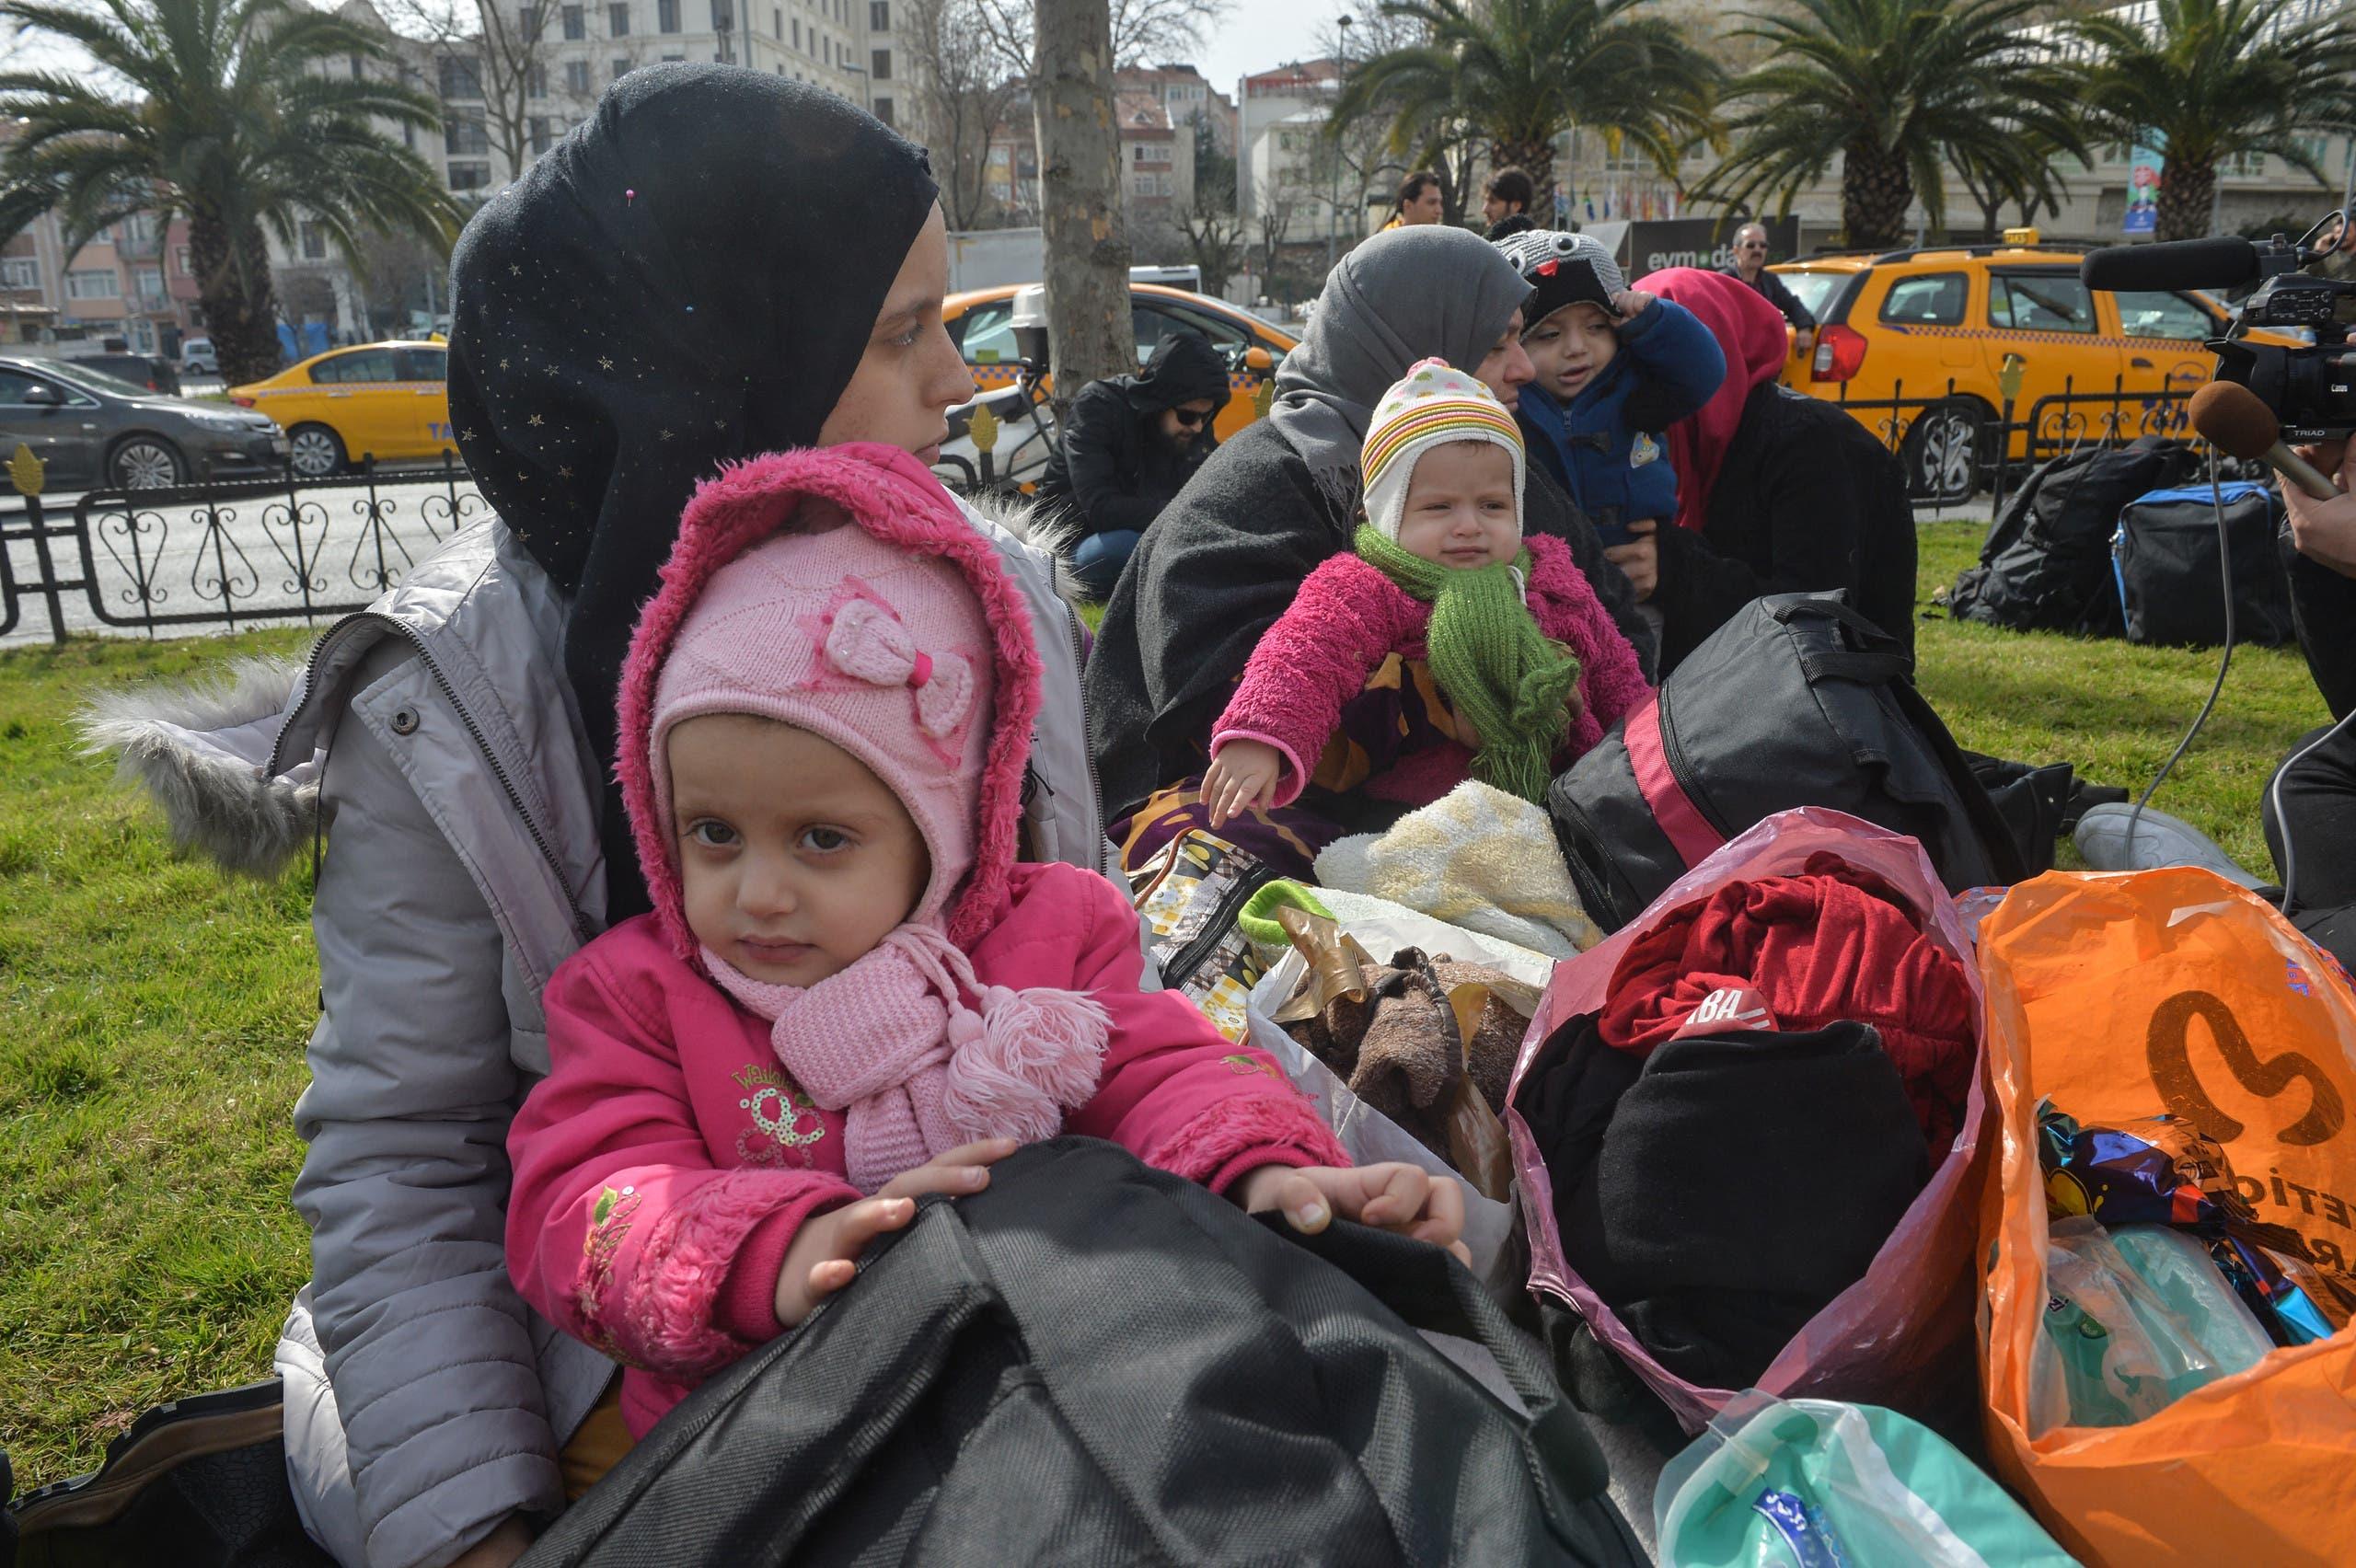 لاجئون سوريون في تركيا (أرشيفية- فرانس برس)